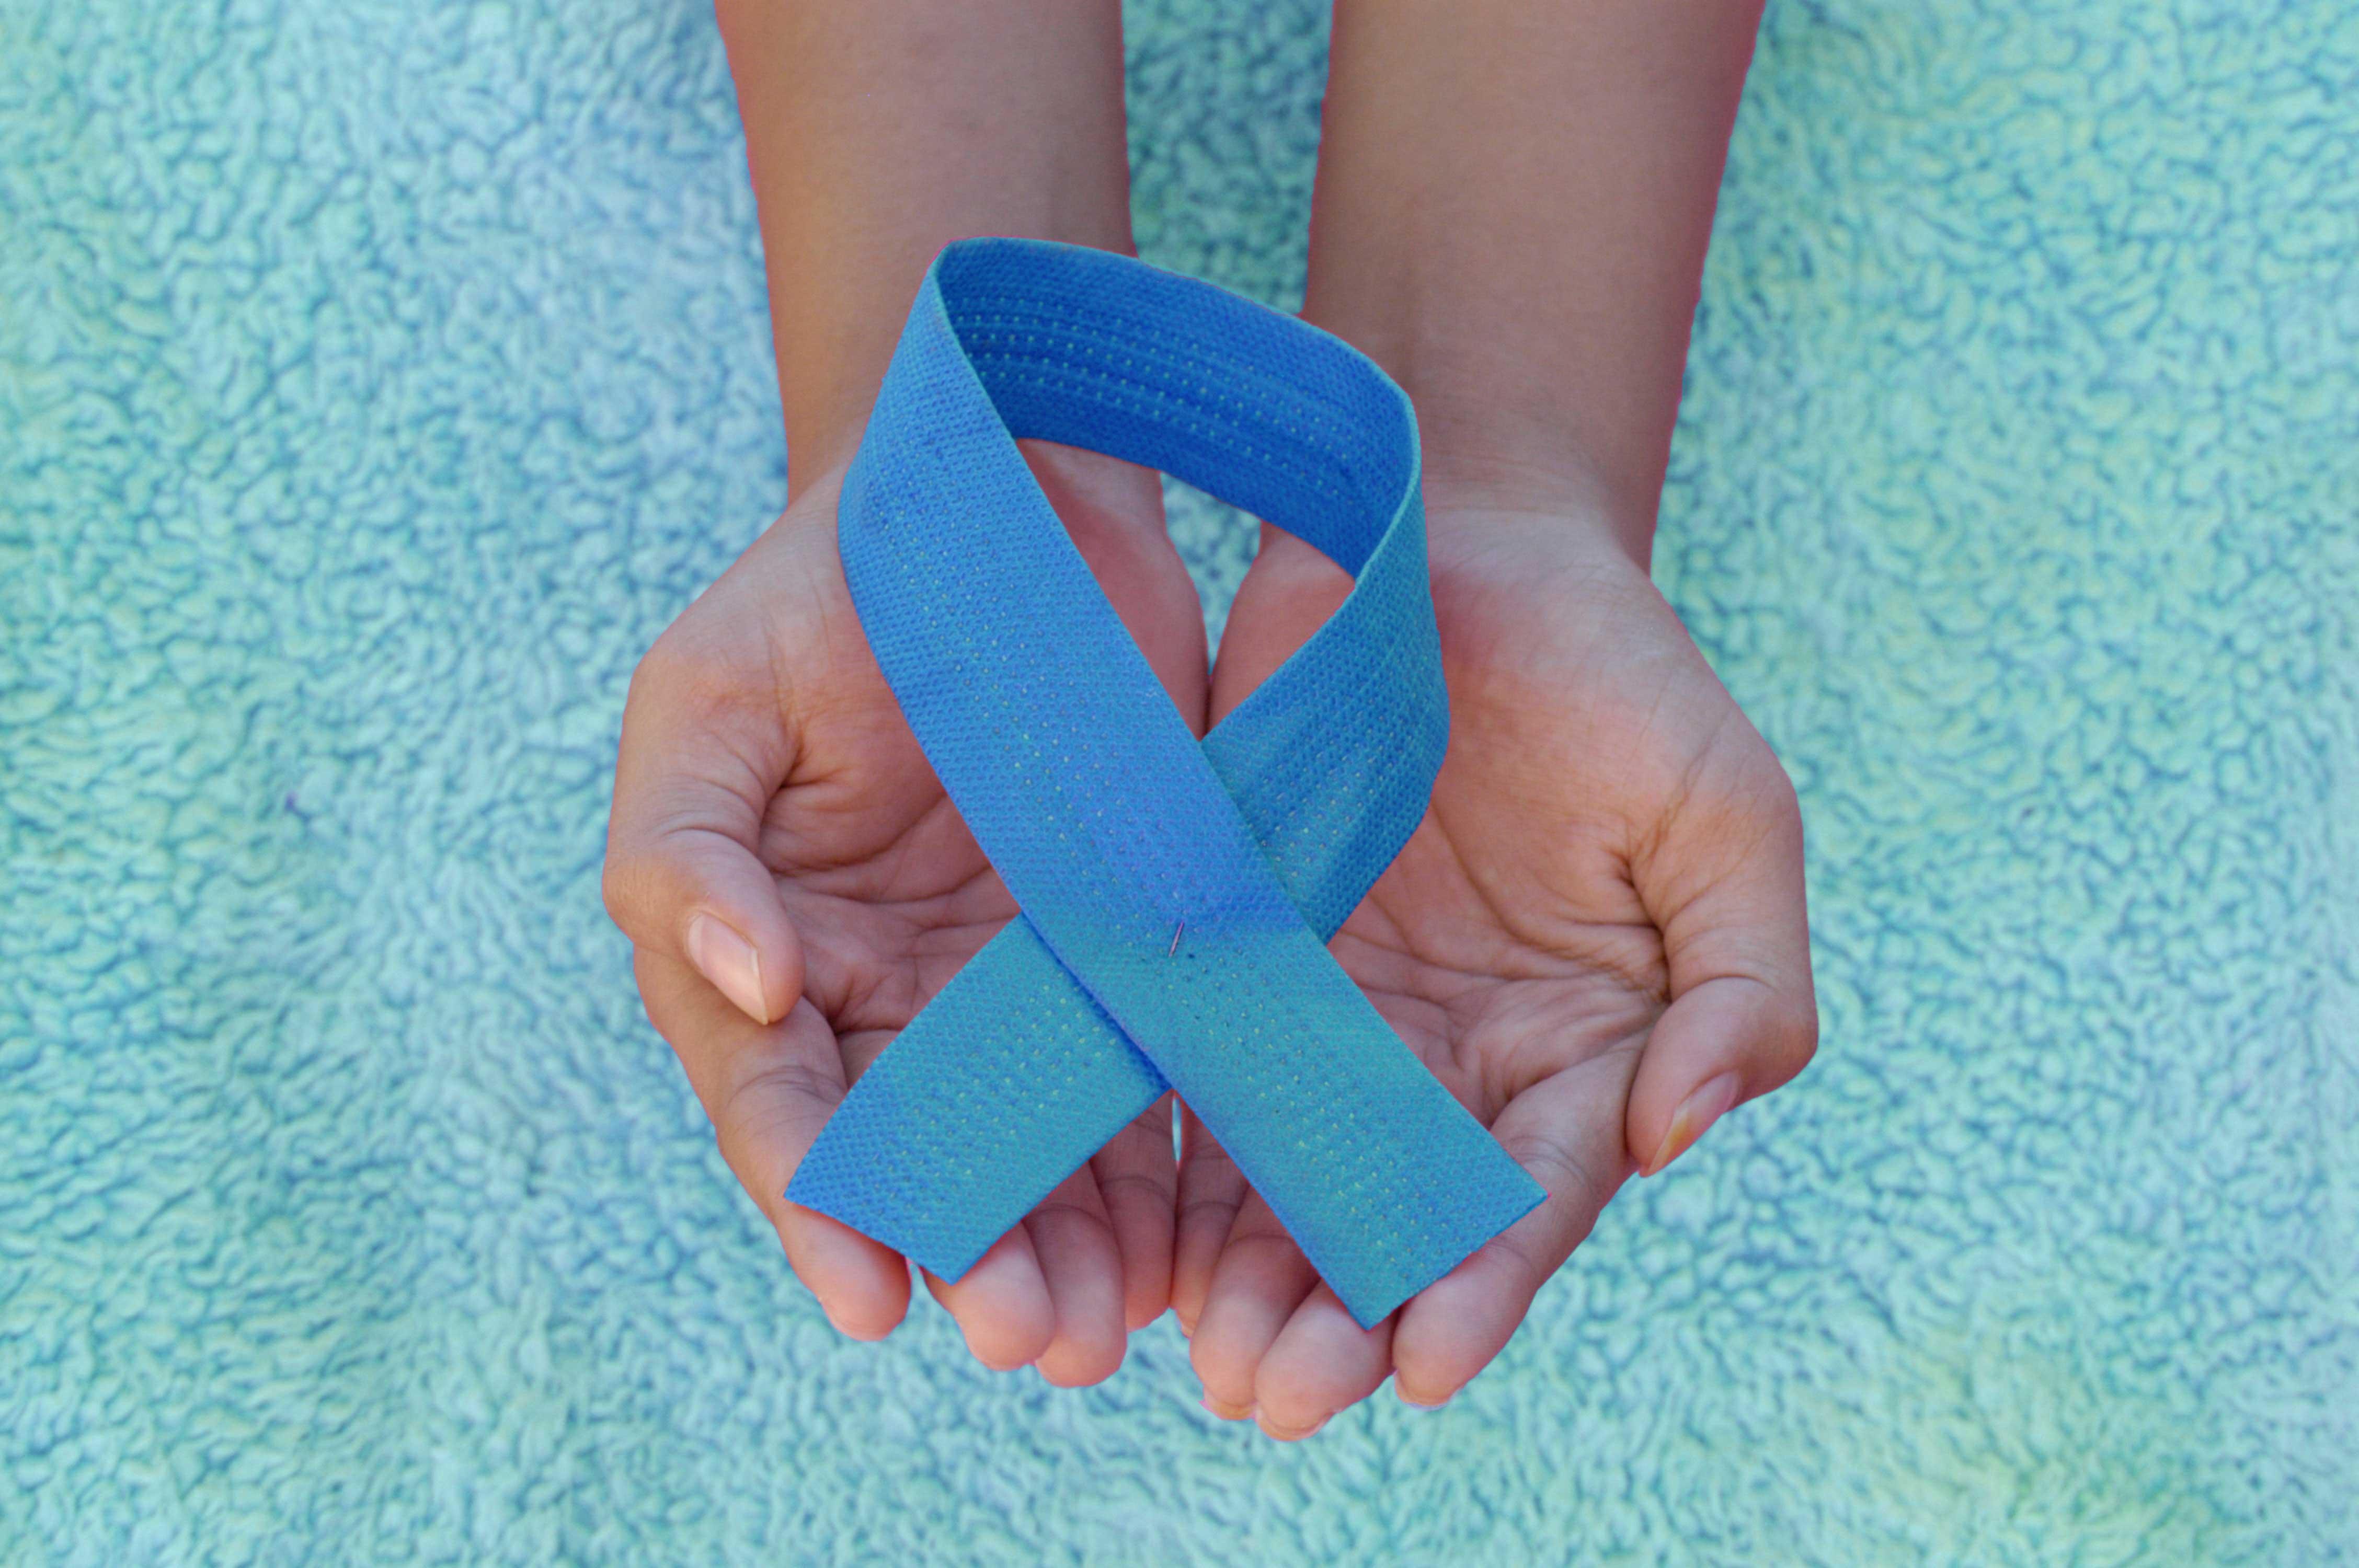 Awareness Ribbon Image